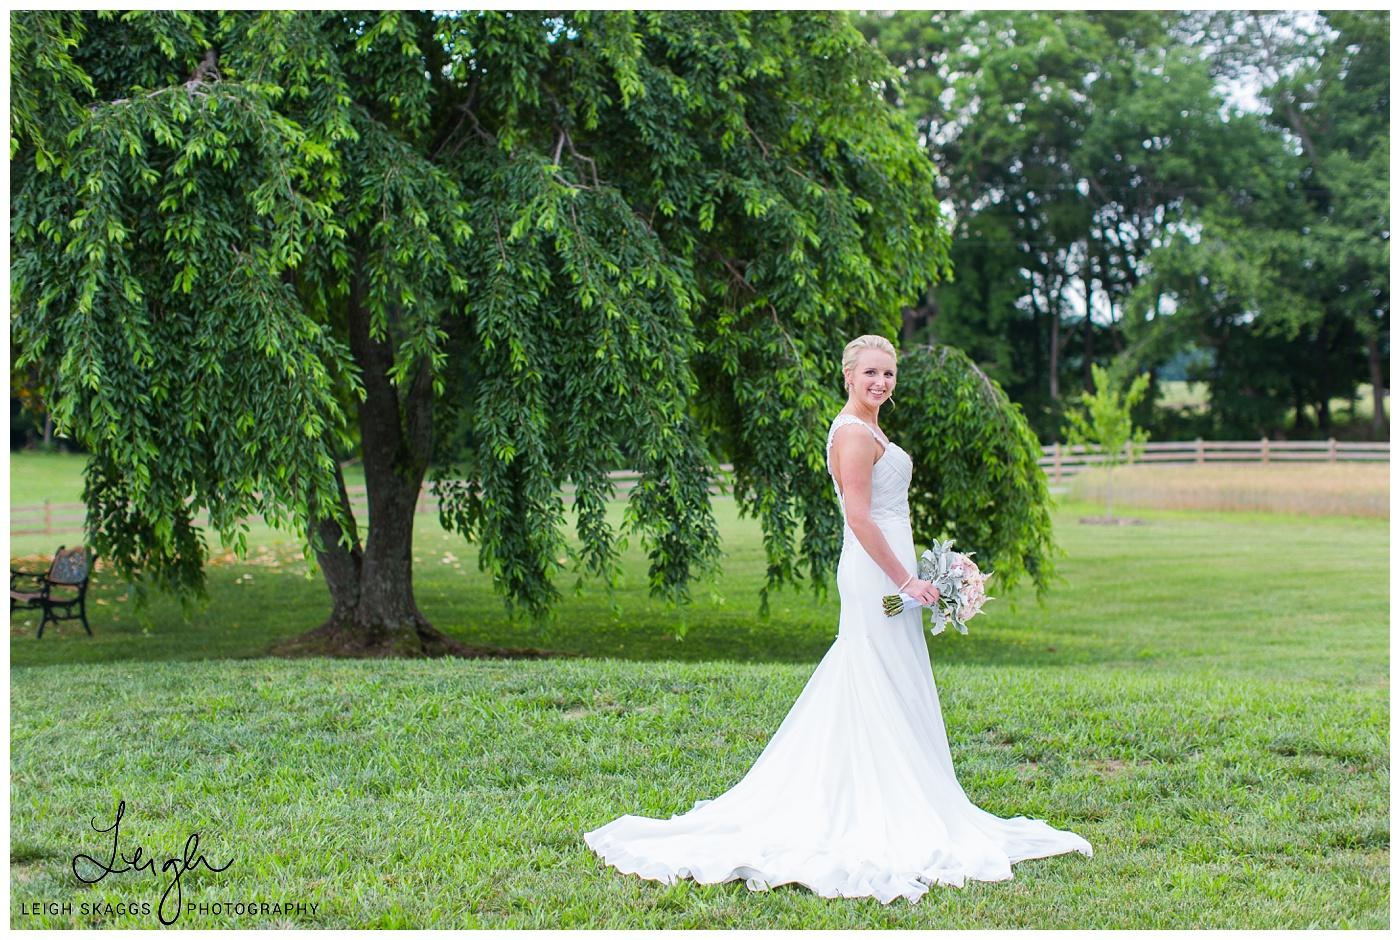 Kendall & Erik | Fairview Farm Wedding